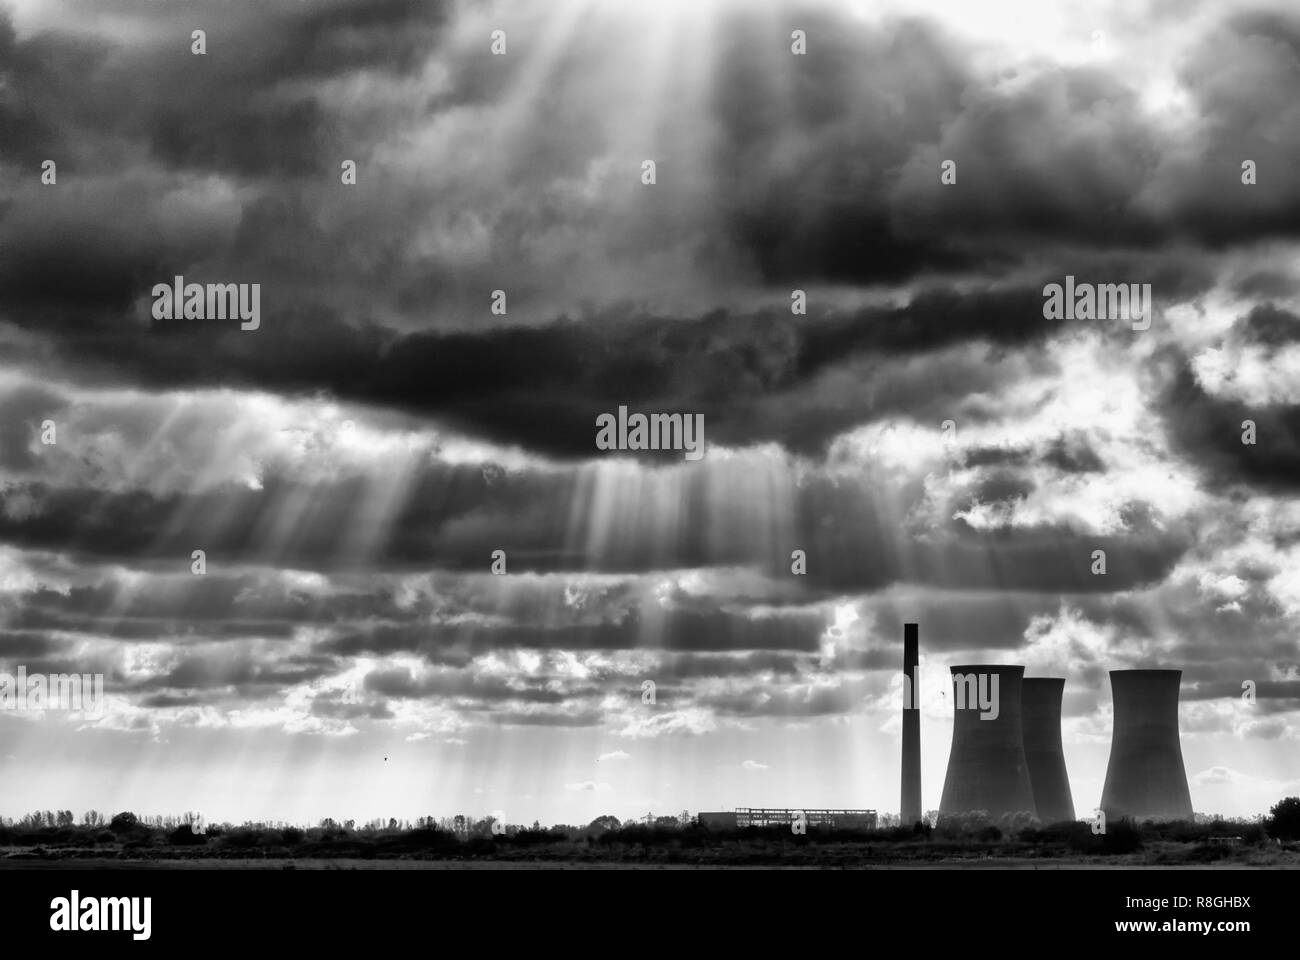 Richborough Power Station in Kent - Stock Image